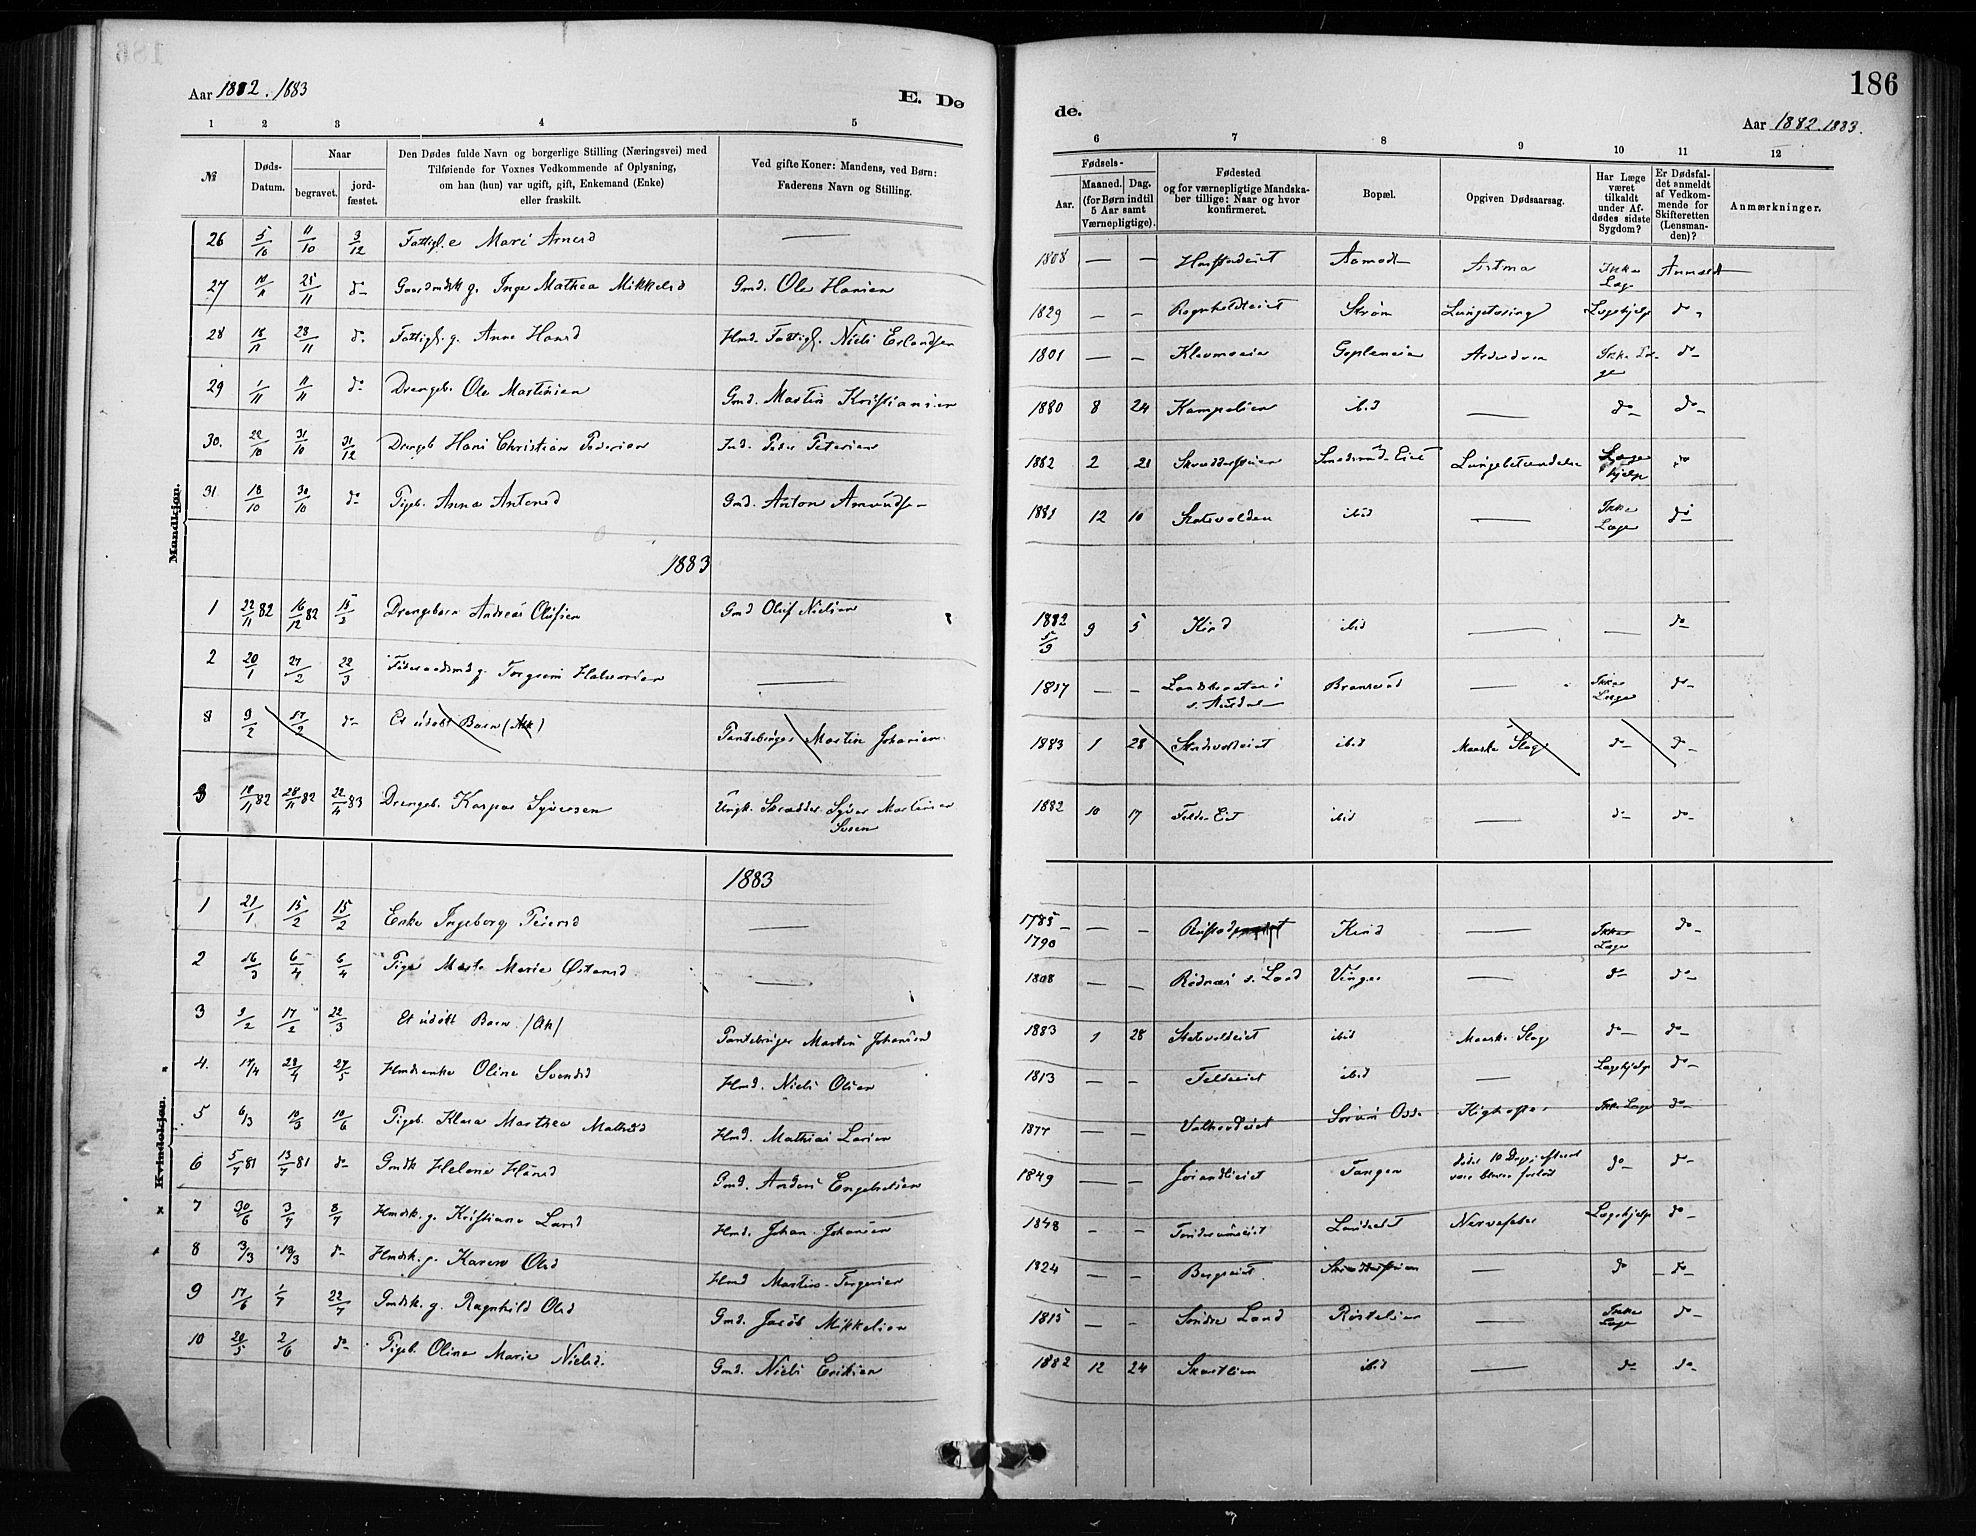 SAH, Nordre Land prestekontor, Ministerialbok nr. 4, 1882-1896, s. 186